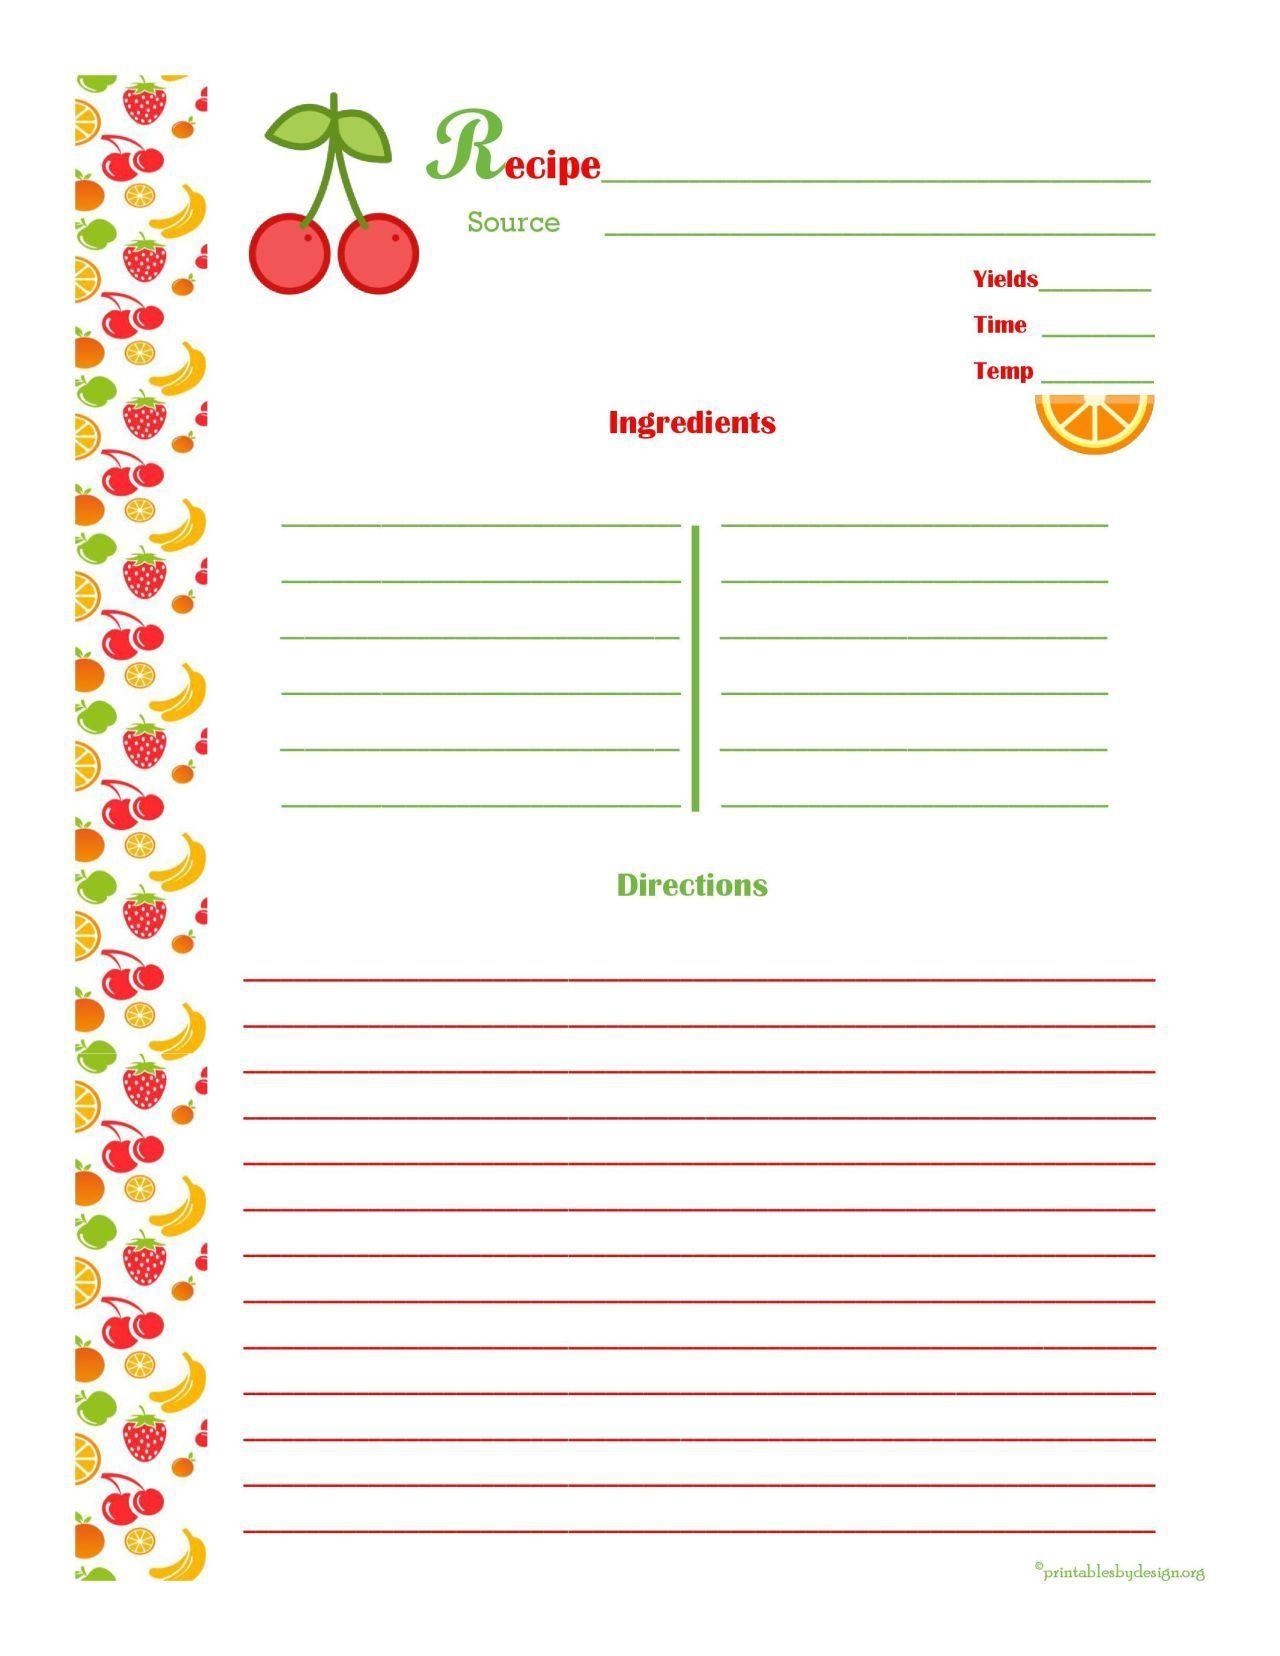 001 Striking 3 X 5 Recipe Card Template Microsoft Word Idea Full